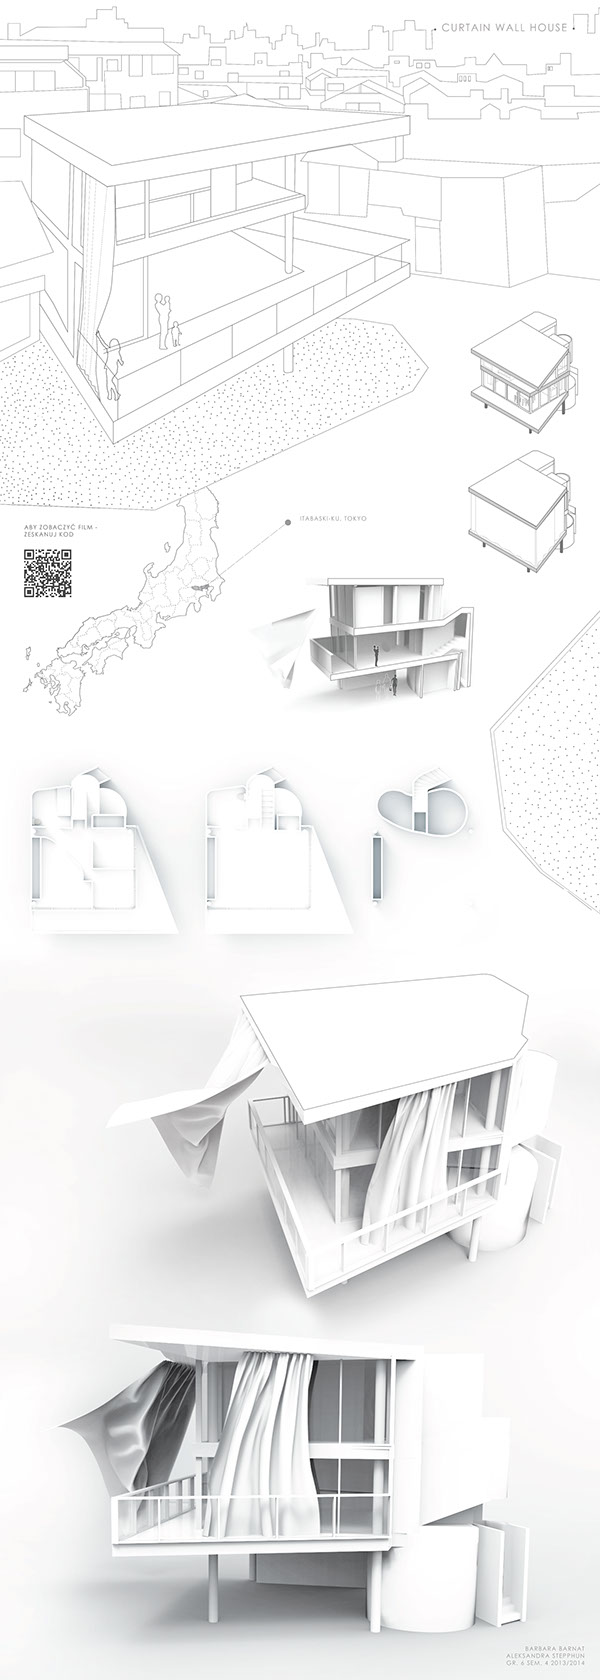 Curtain Wall House By Shigeru Ban On Behance